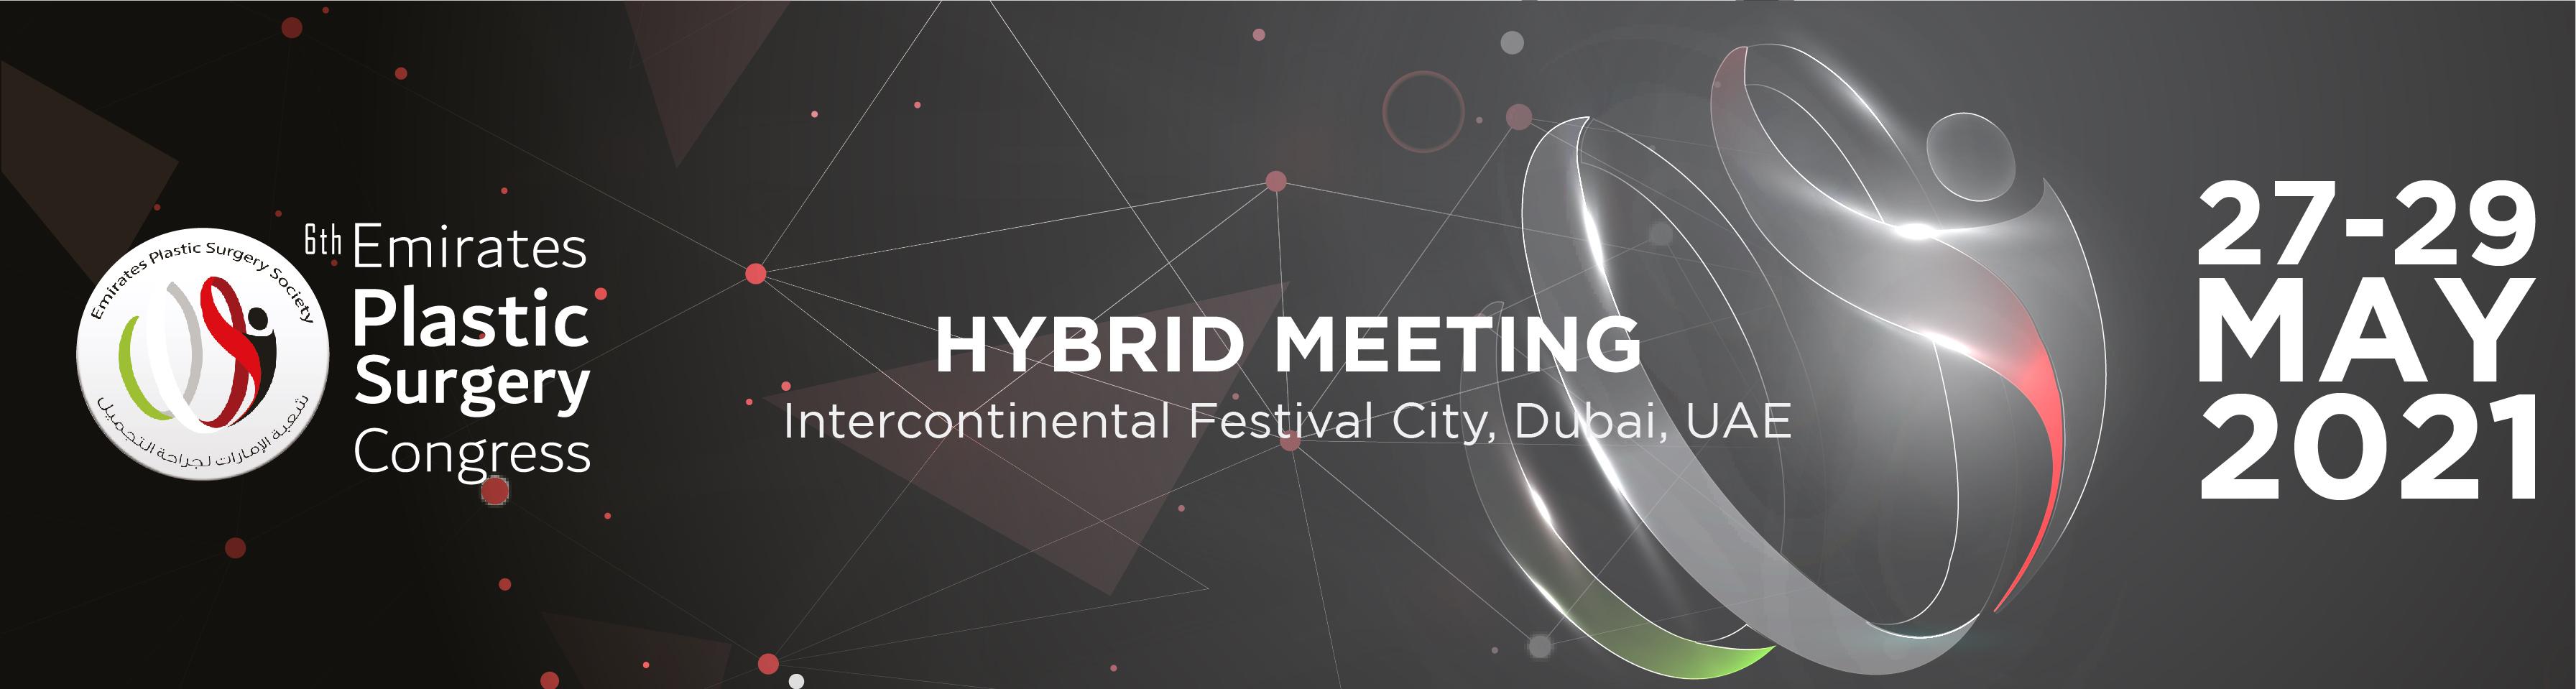 6th Emirates Plastic Surgery Congress 2021